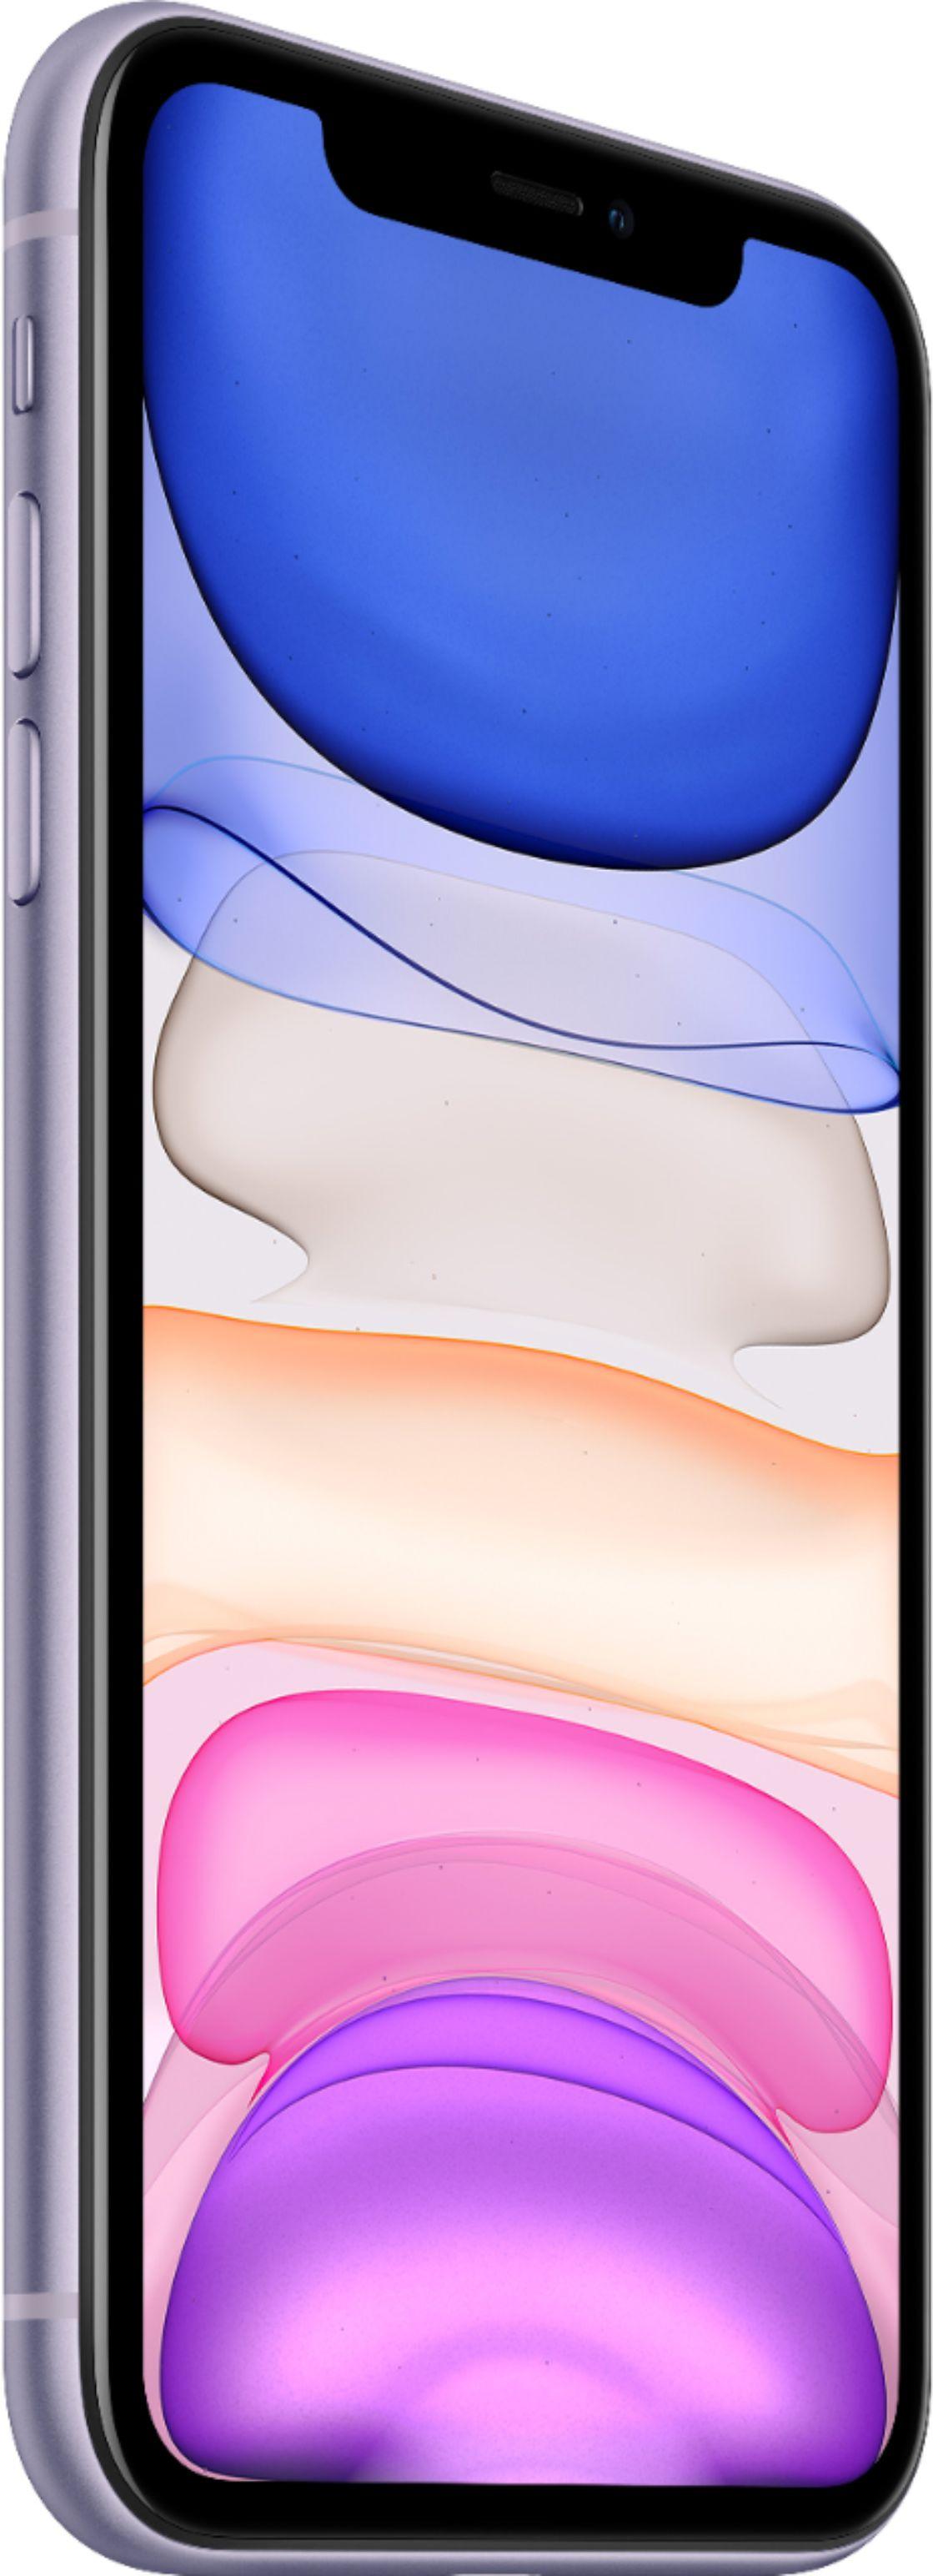 thumbnail 10 - Apple iPhone 11 64GB Factory Unlocked 4G LTE Smartphone